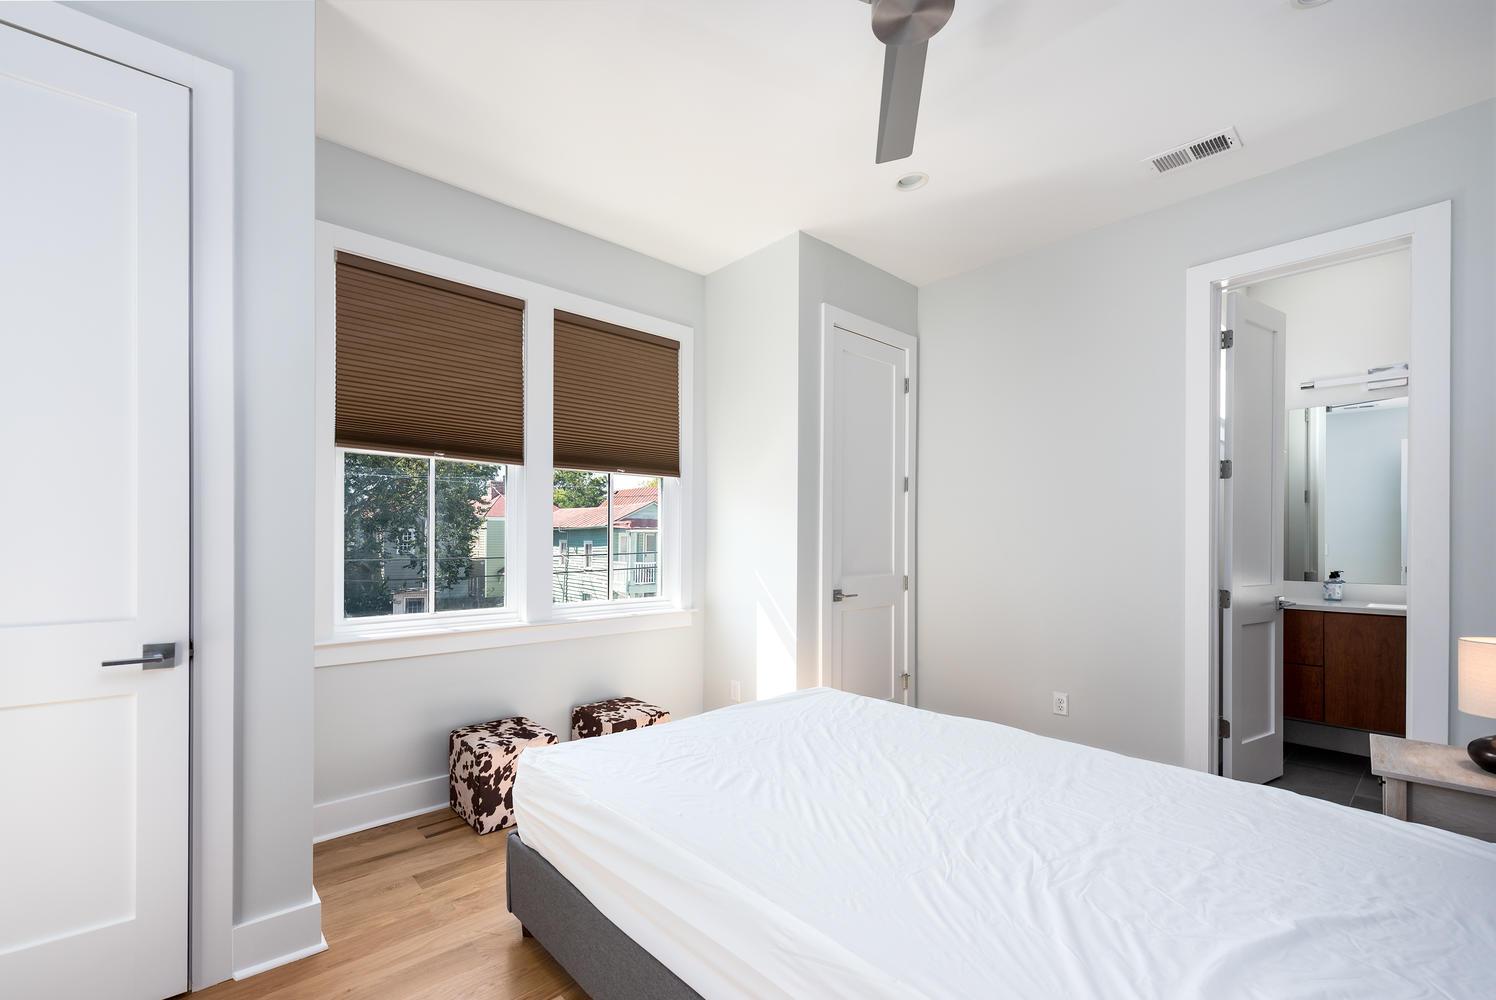 Cannonborough-Elliottborough Homes For Sale - 92 Spring, Charleston, SC - 8